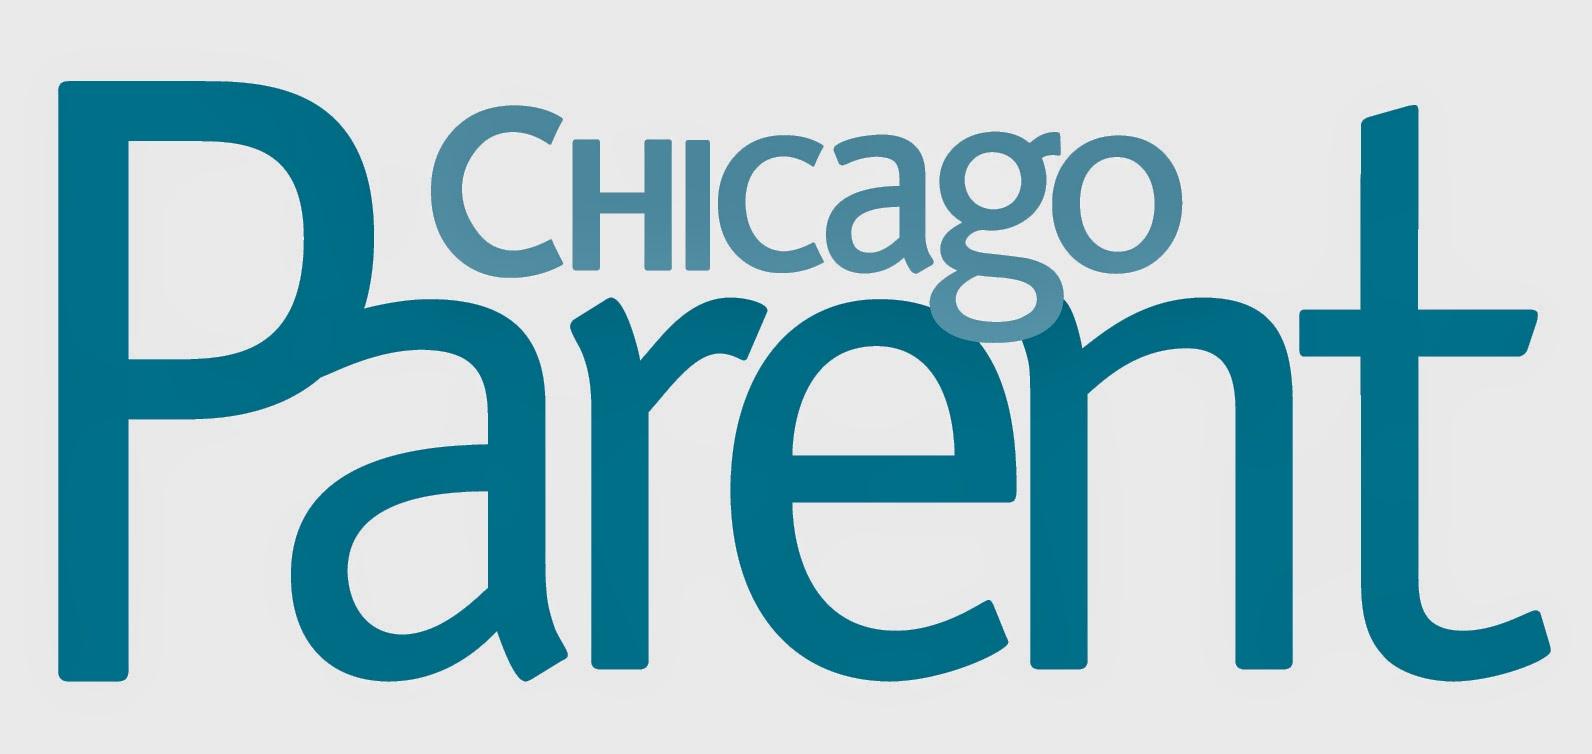 2015 LTYM Chicago Local Sponsor